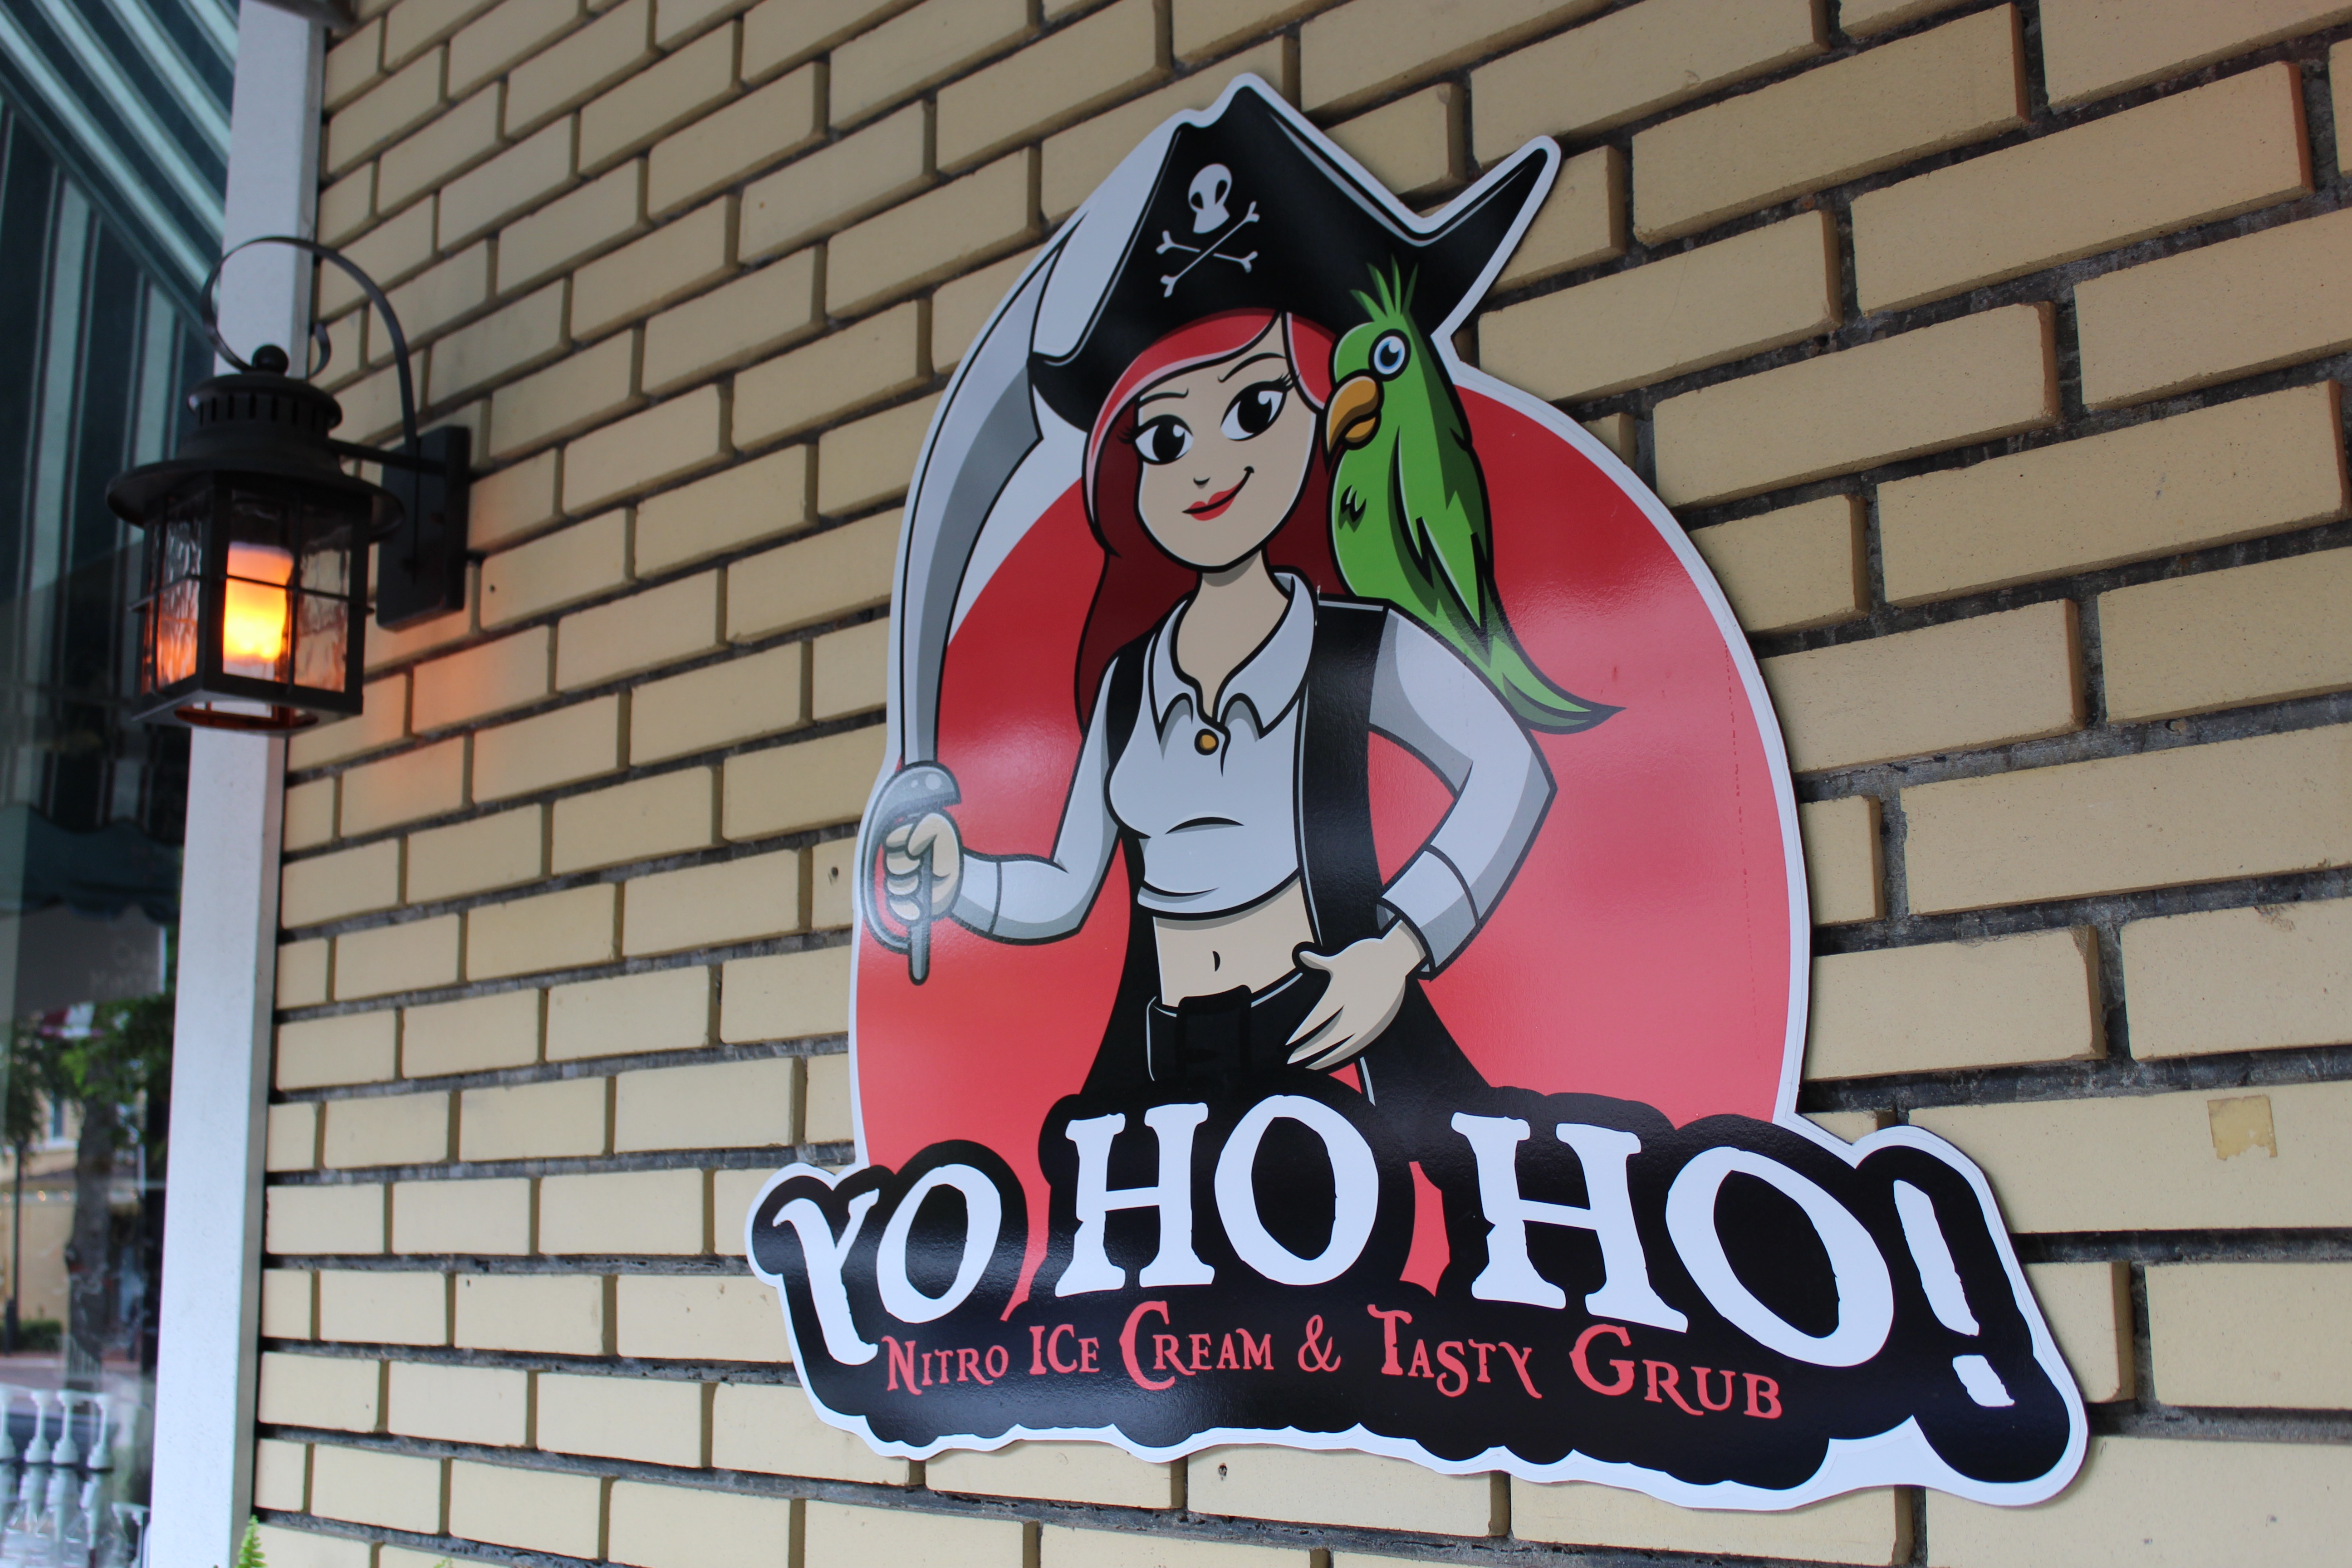 outdoor sign and logo for YoHoHo nitro ice cream & tasty grub